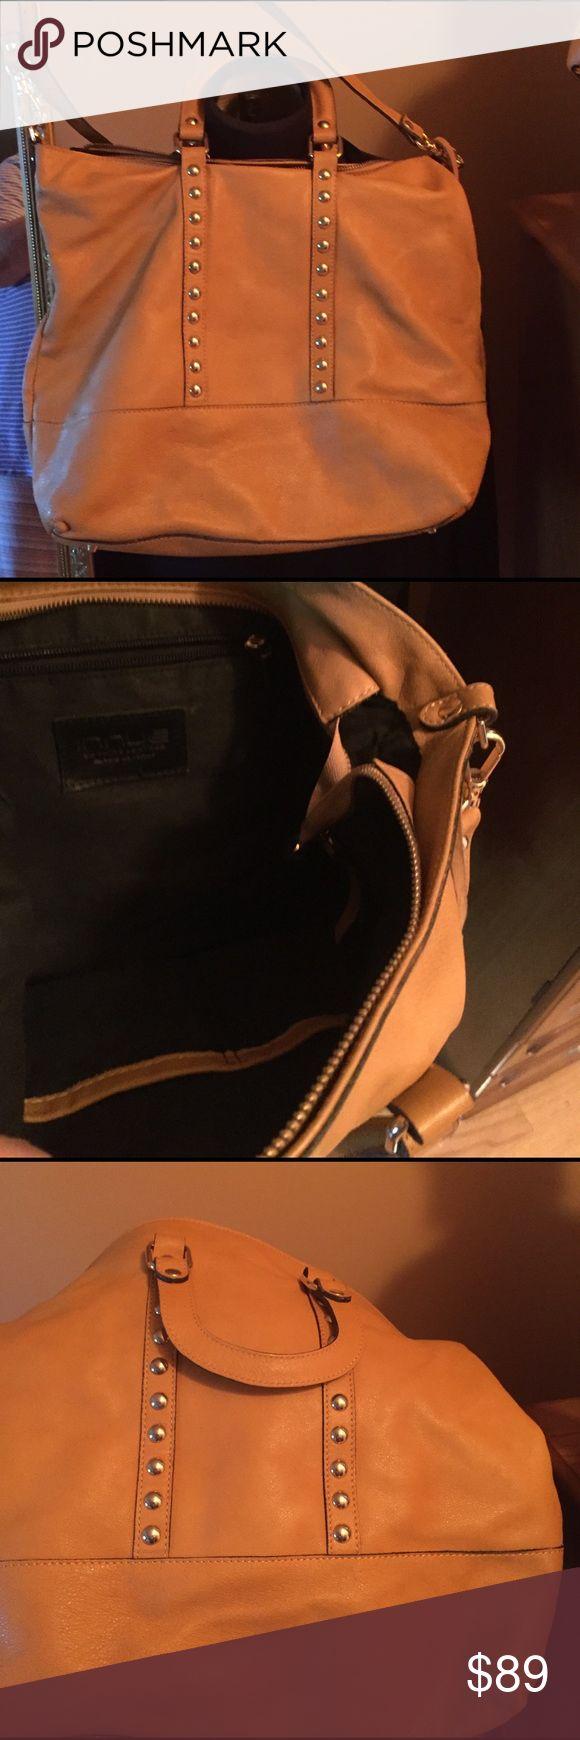 Camel genuine leather bag Italian soft leather camel bag immue Bags Shoulder Bags